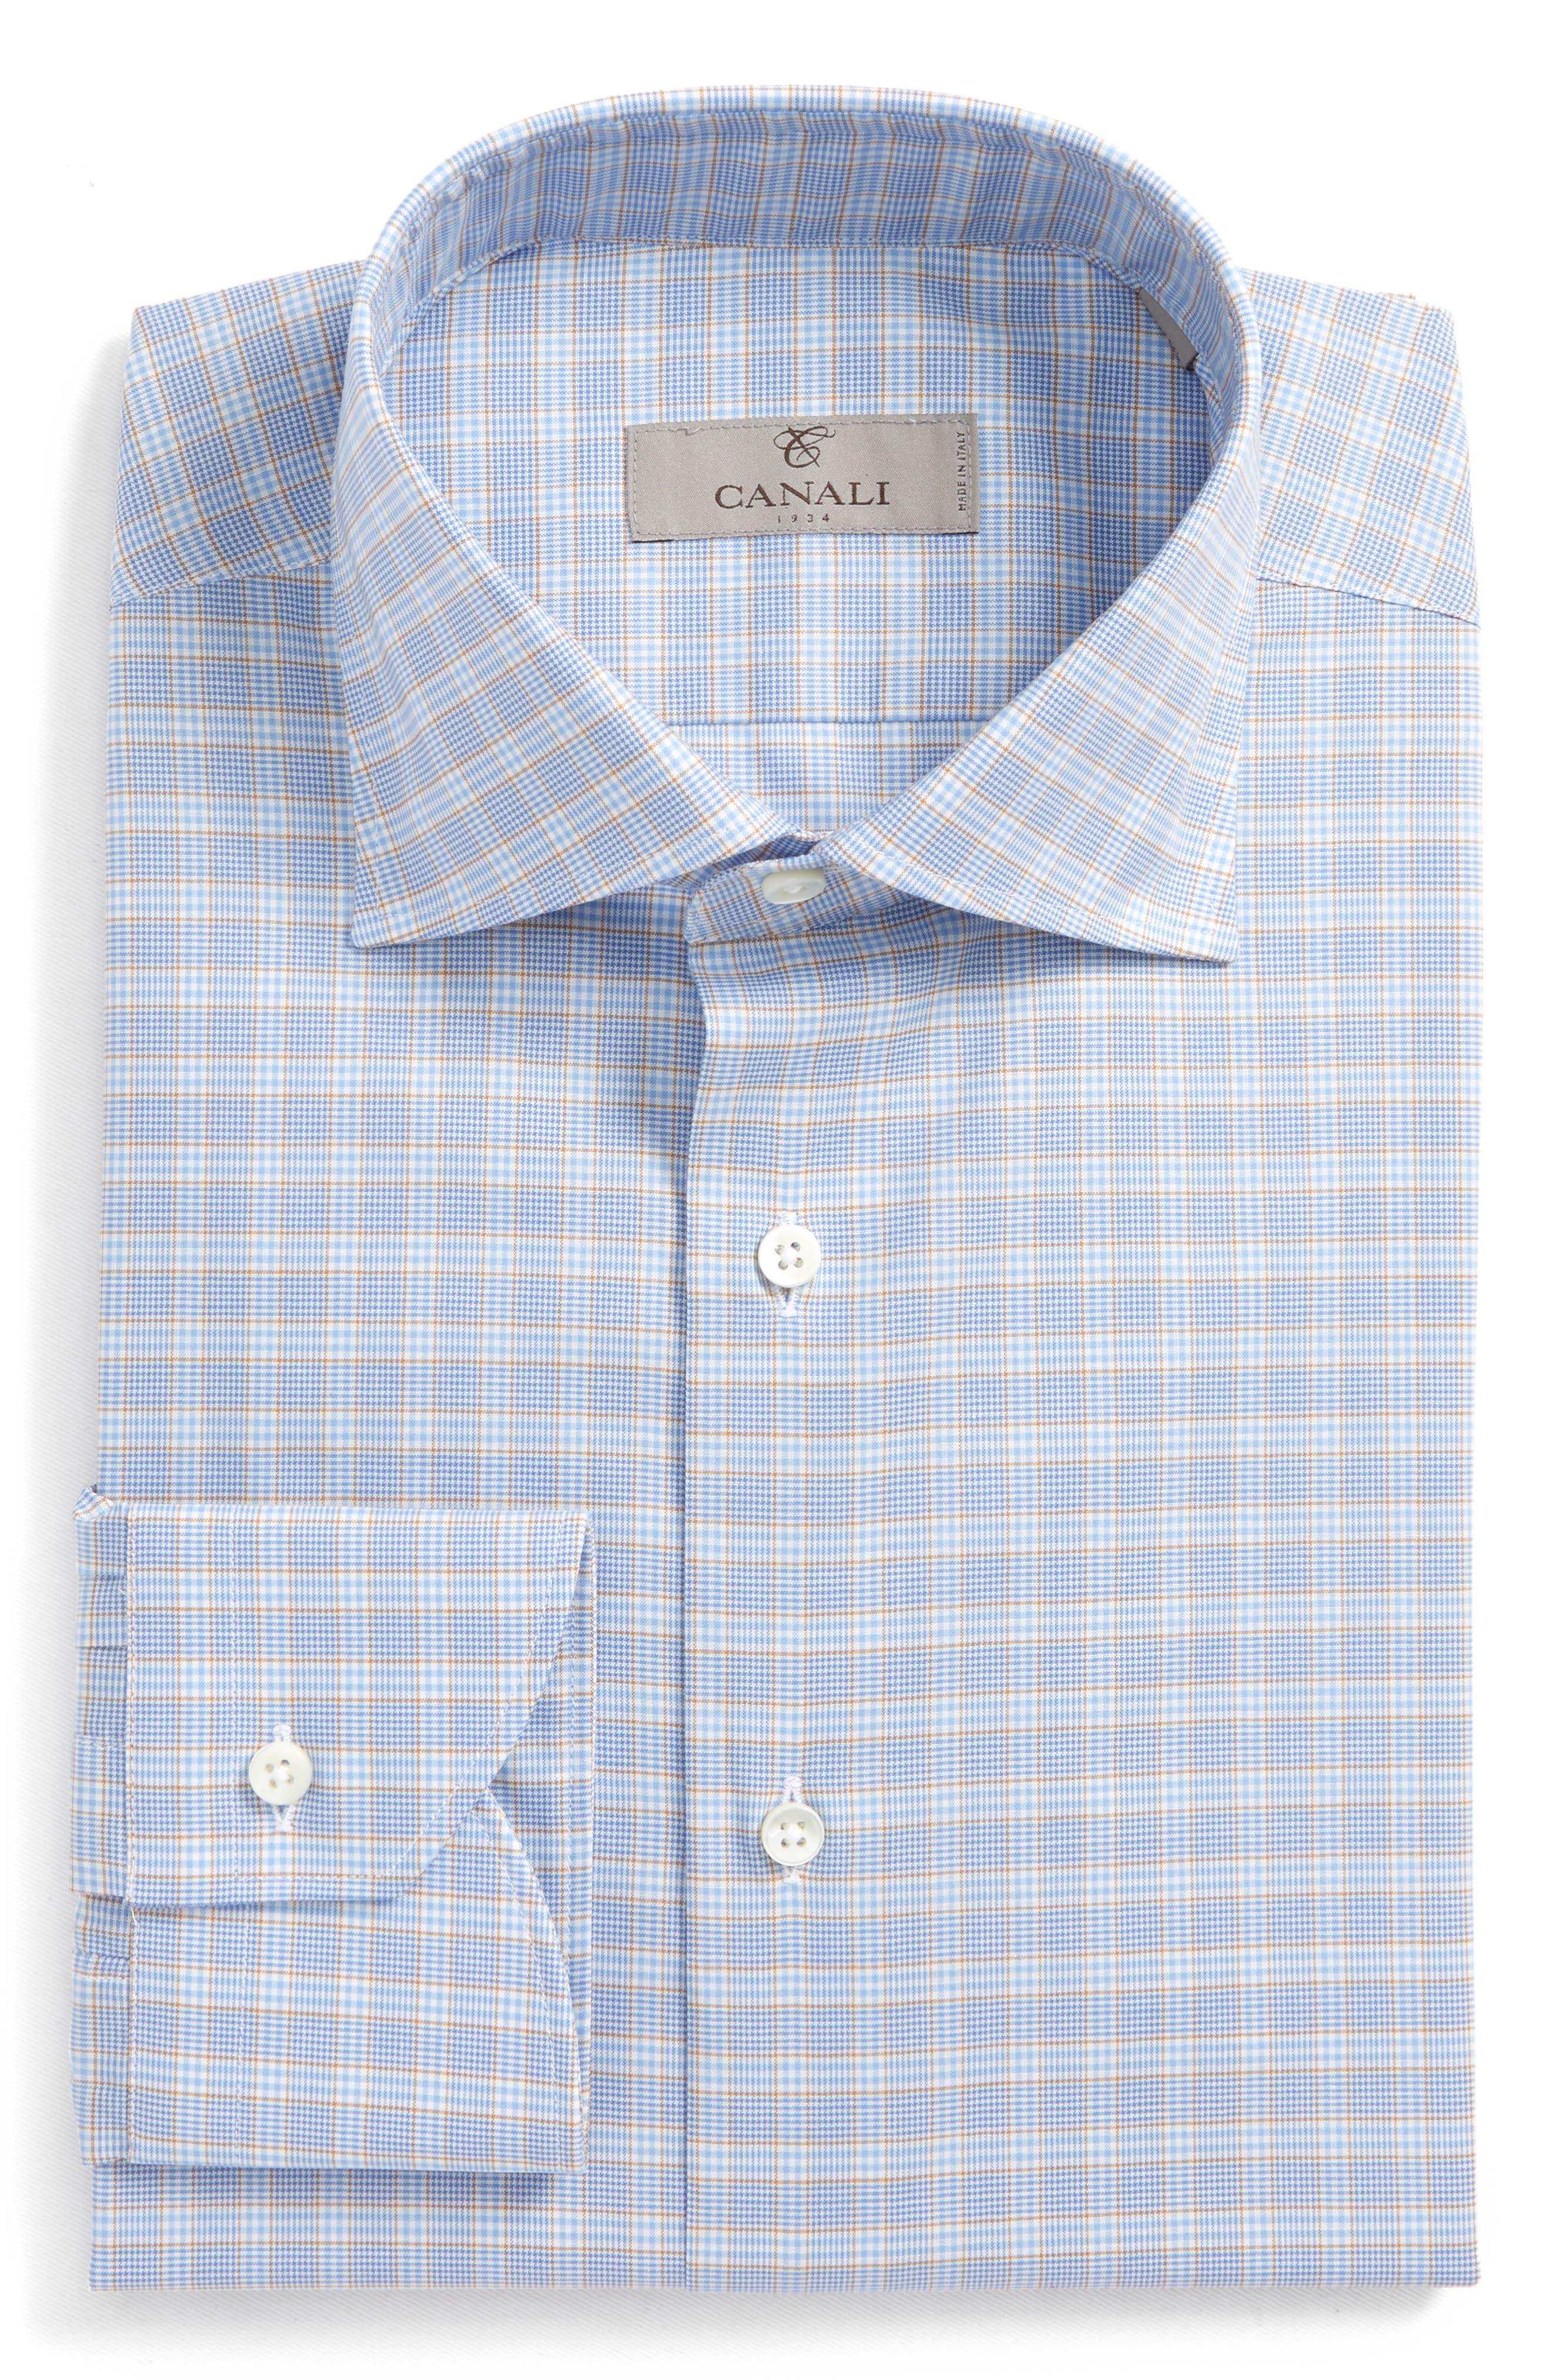 Regular Fit Plaid Dress Shirt,                             Main thumbnail 1, color,